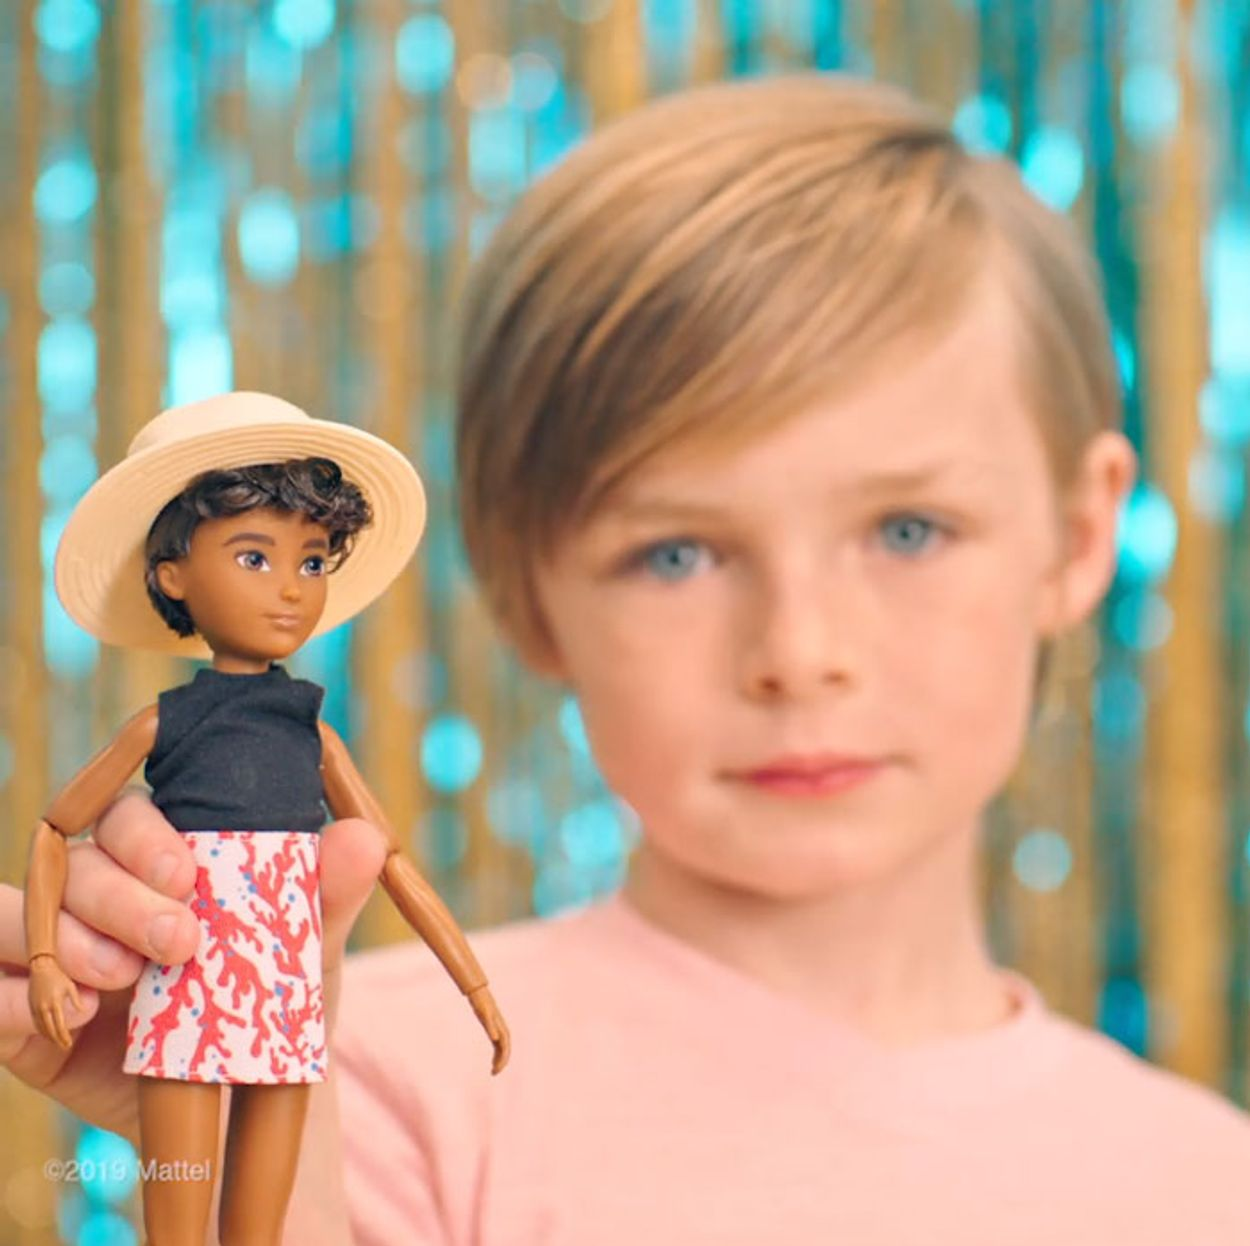 2A1 5d8c69bdc5ca6-gender-neutral-dolls-toy-company-mattel-5d8b36050f833__700